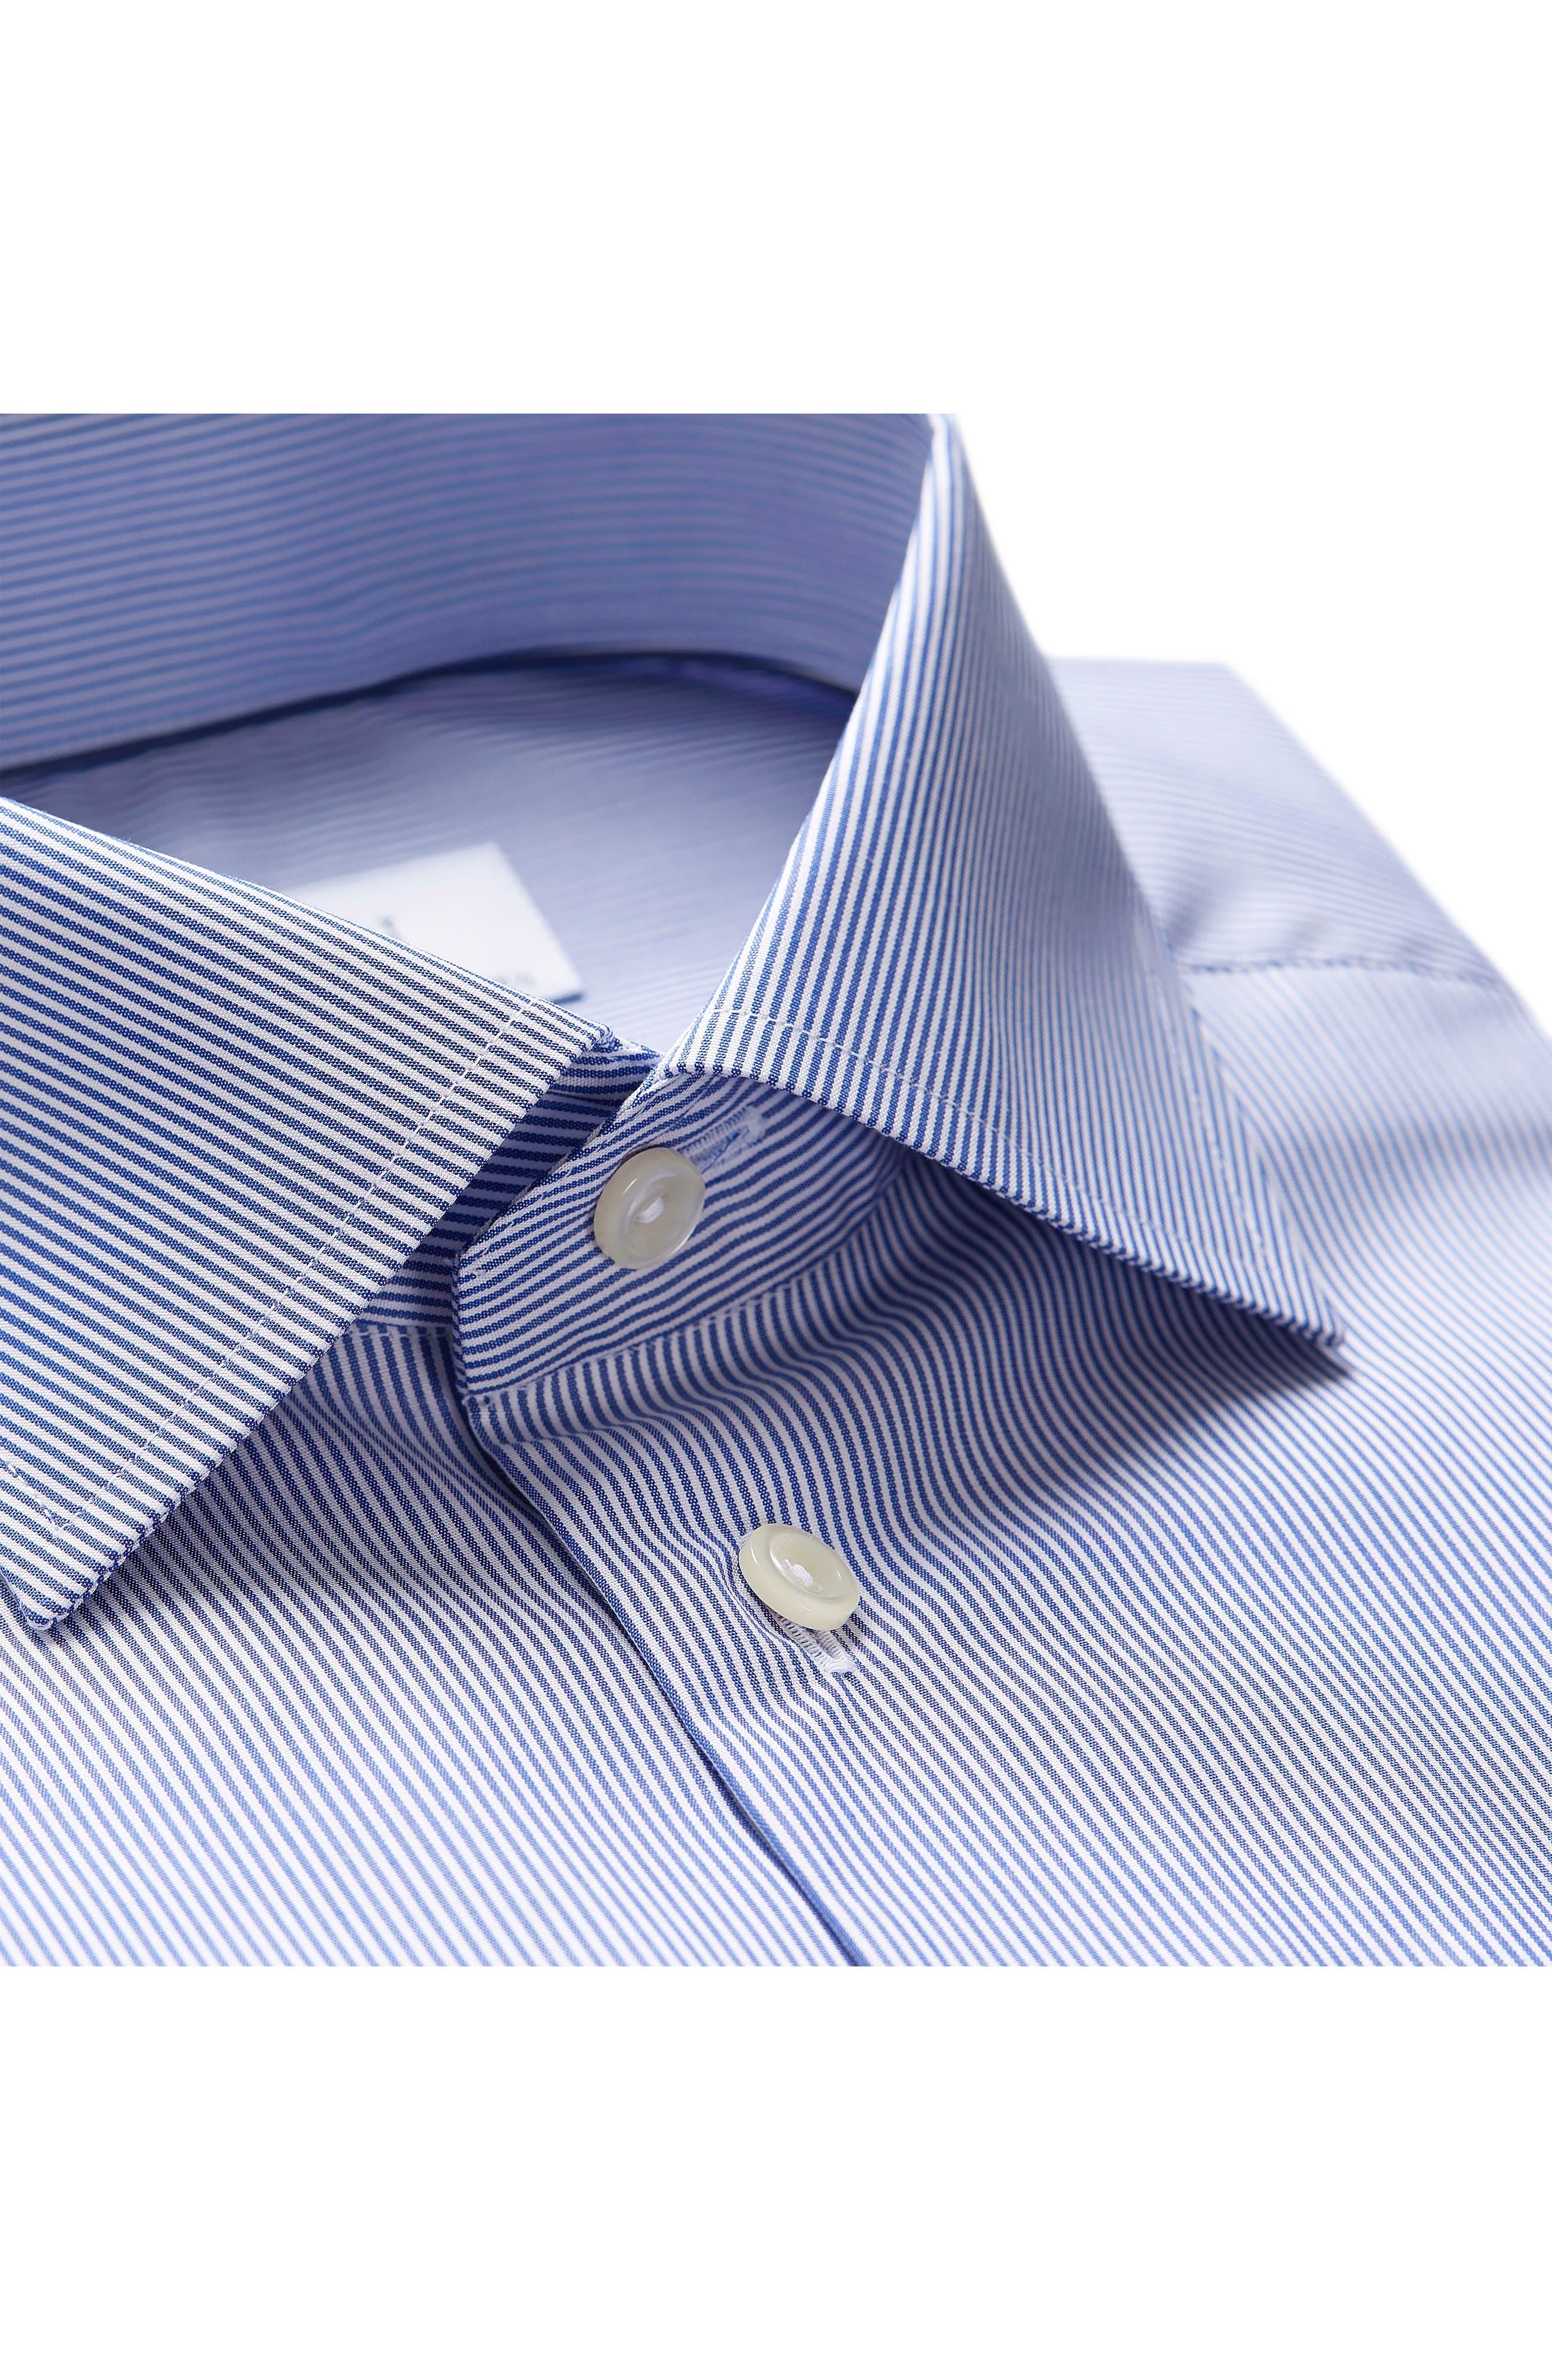 Contemporary Fit Stripe Dress Shirt,                             Alternate thumbnail 2, color,                             Mid Blue